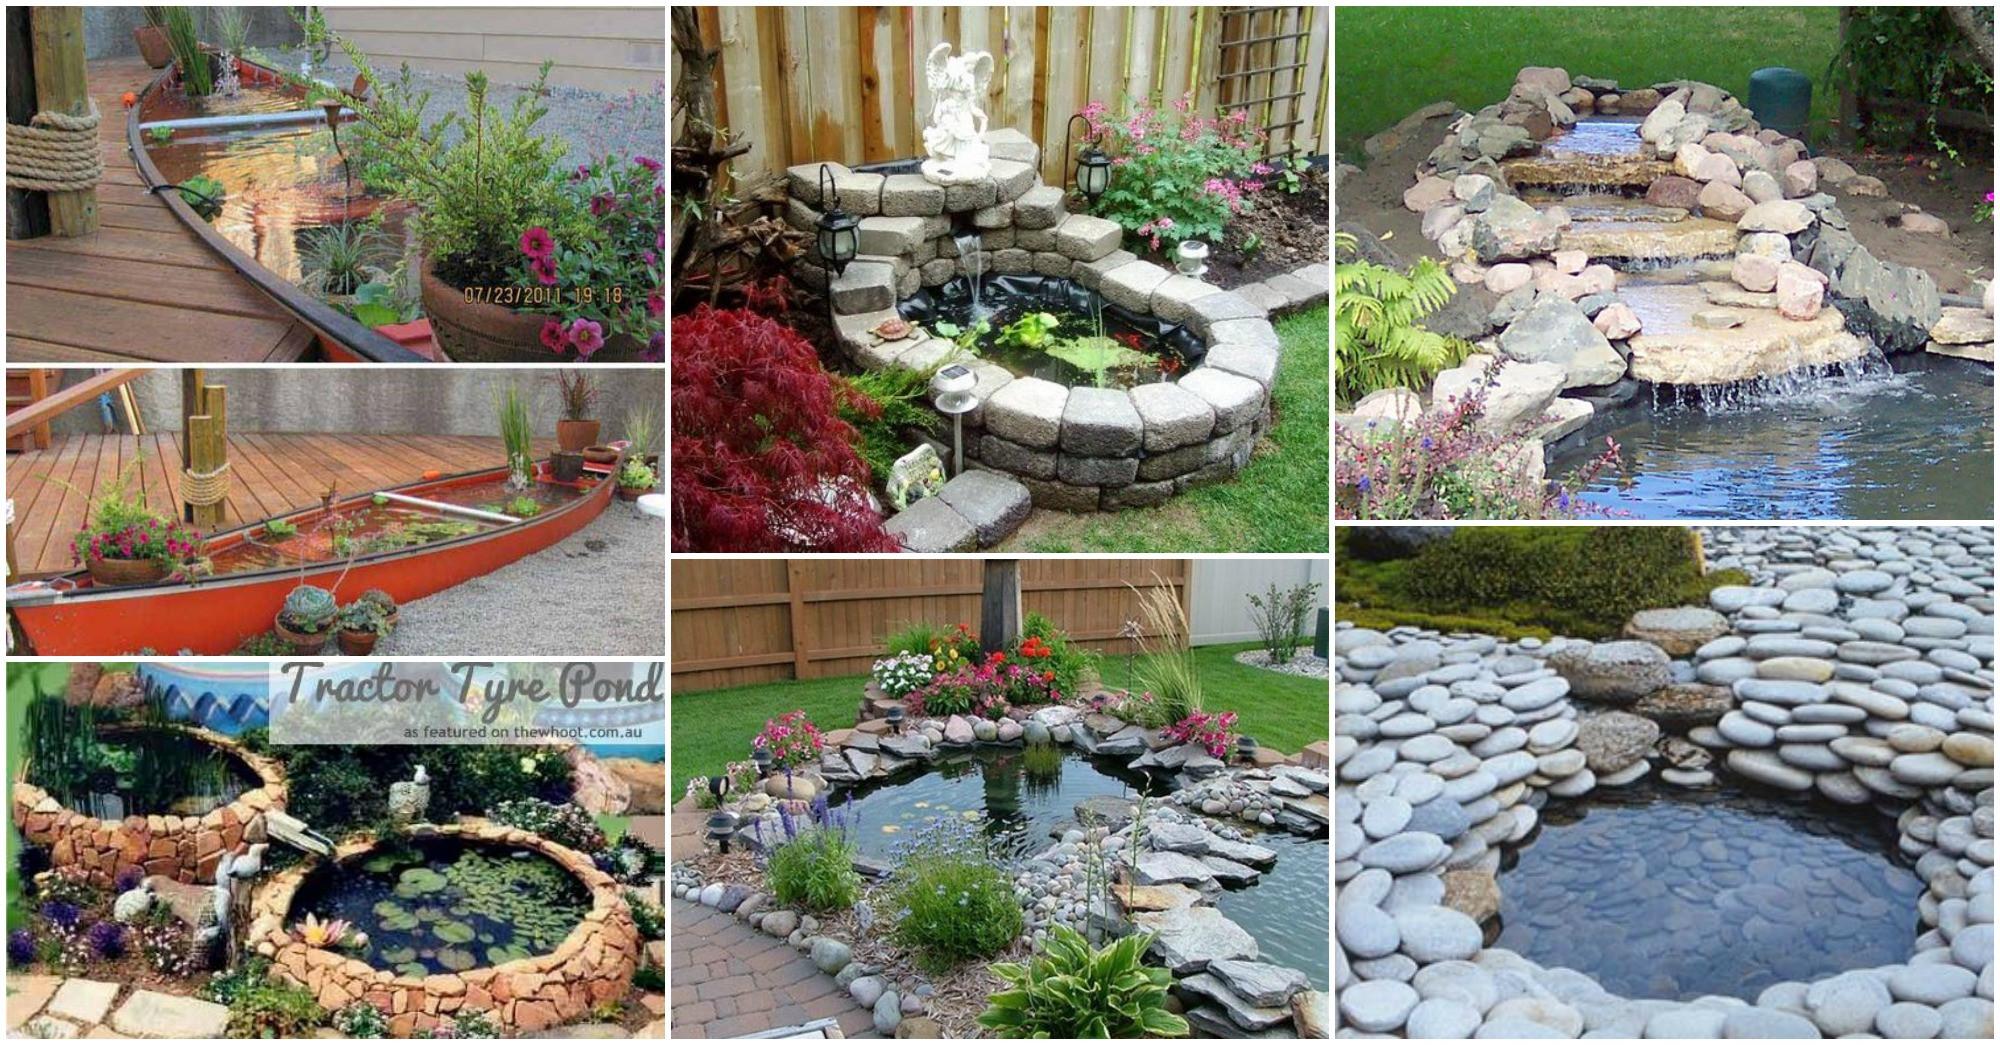 Pond In Backyard  20 DIY Backyard Pond Ideas A Bud That You Will Love